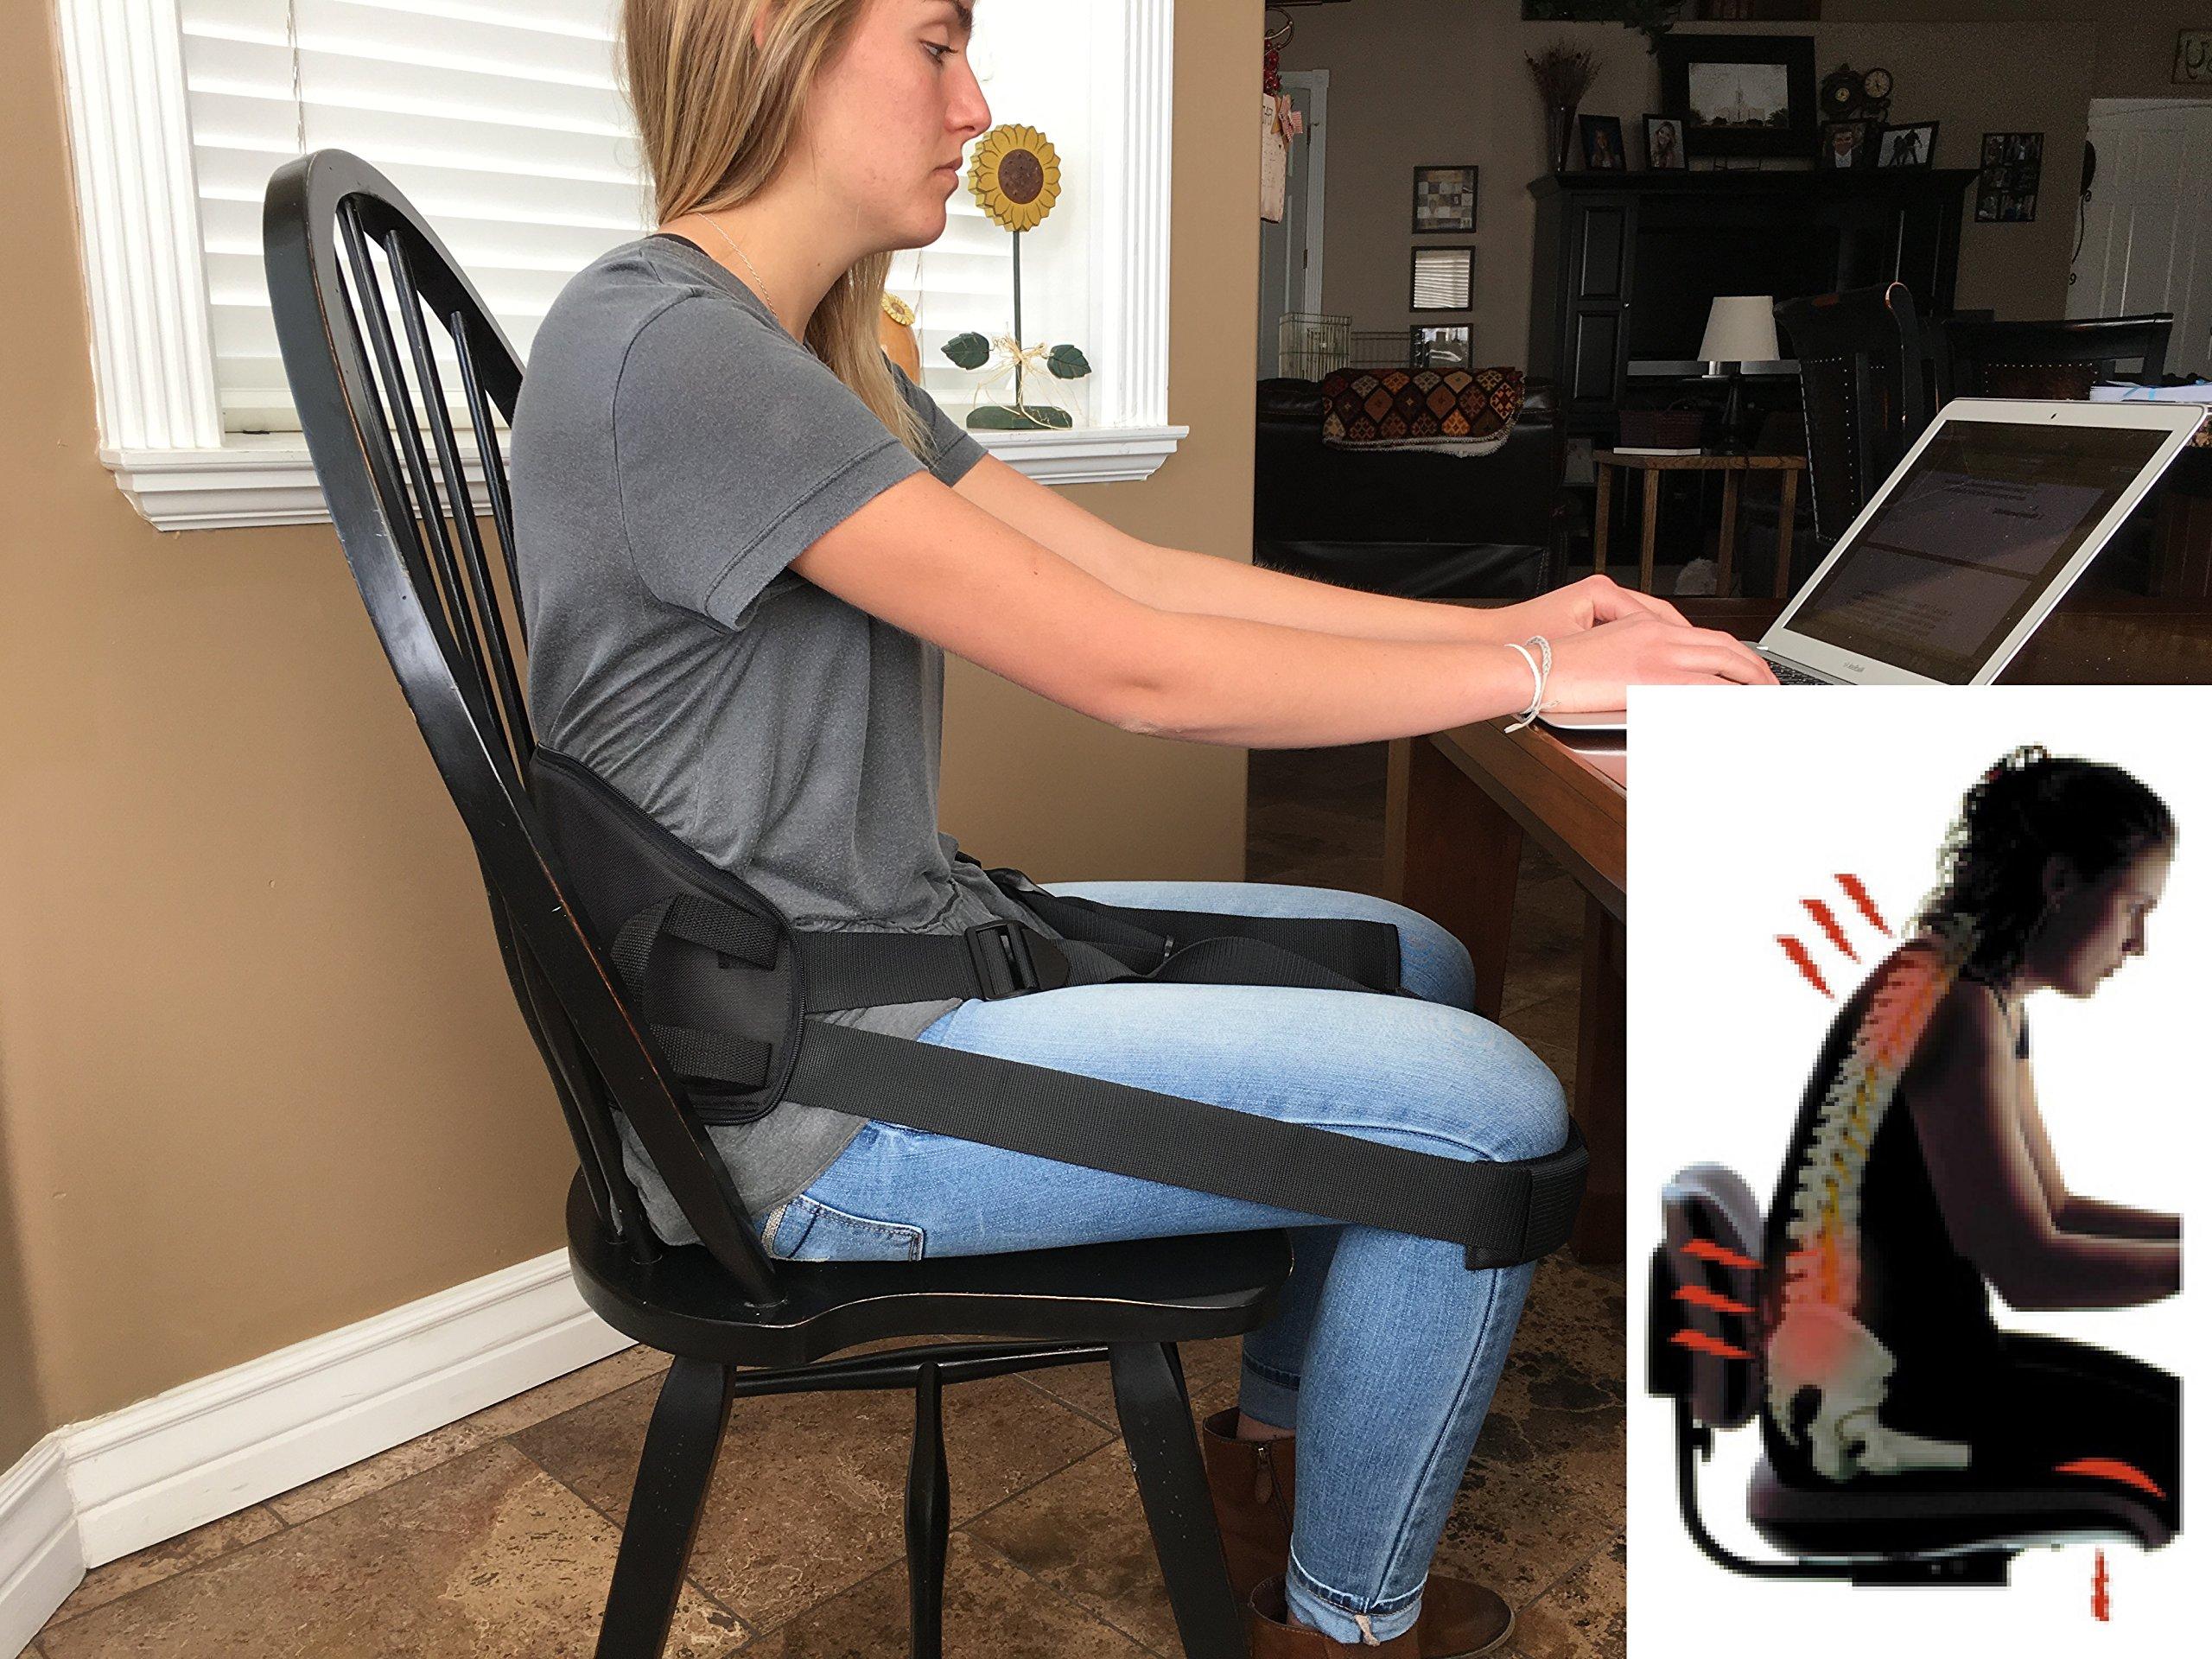 Got'urBack (Medium) Universal Back Support, Posture Correction Strap for a Better Back by Got'urBack (Image #1)